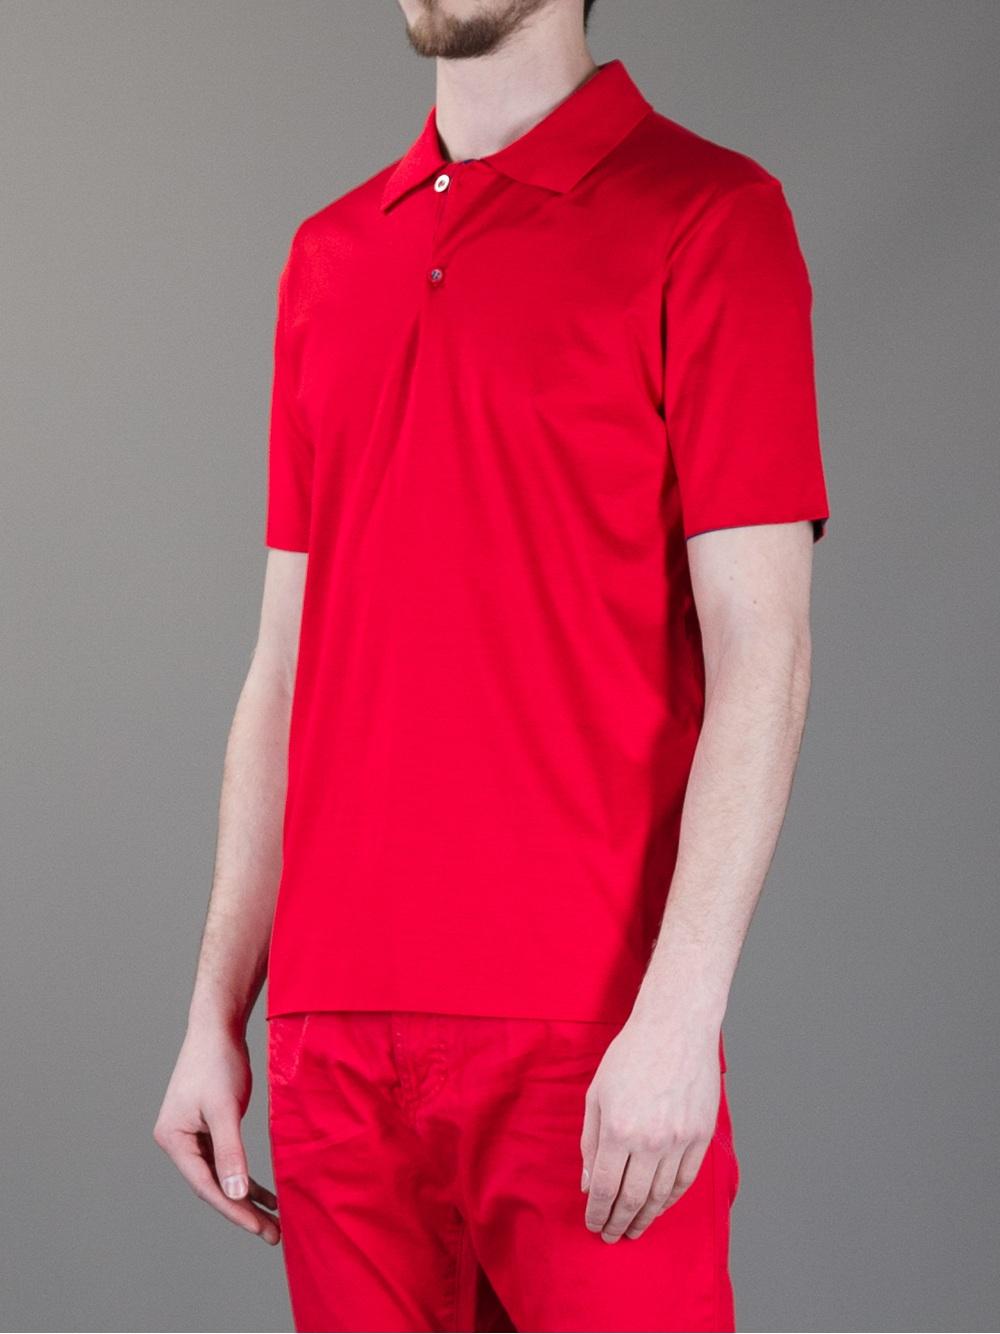 Lyst balenciaga reversible polo shirt in red for men for Balenciaga t shirt red